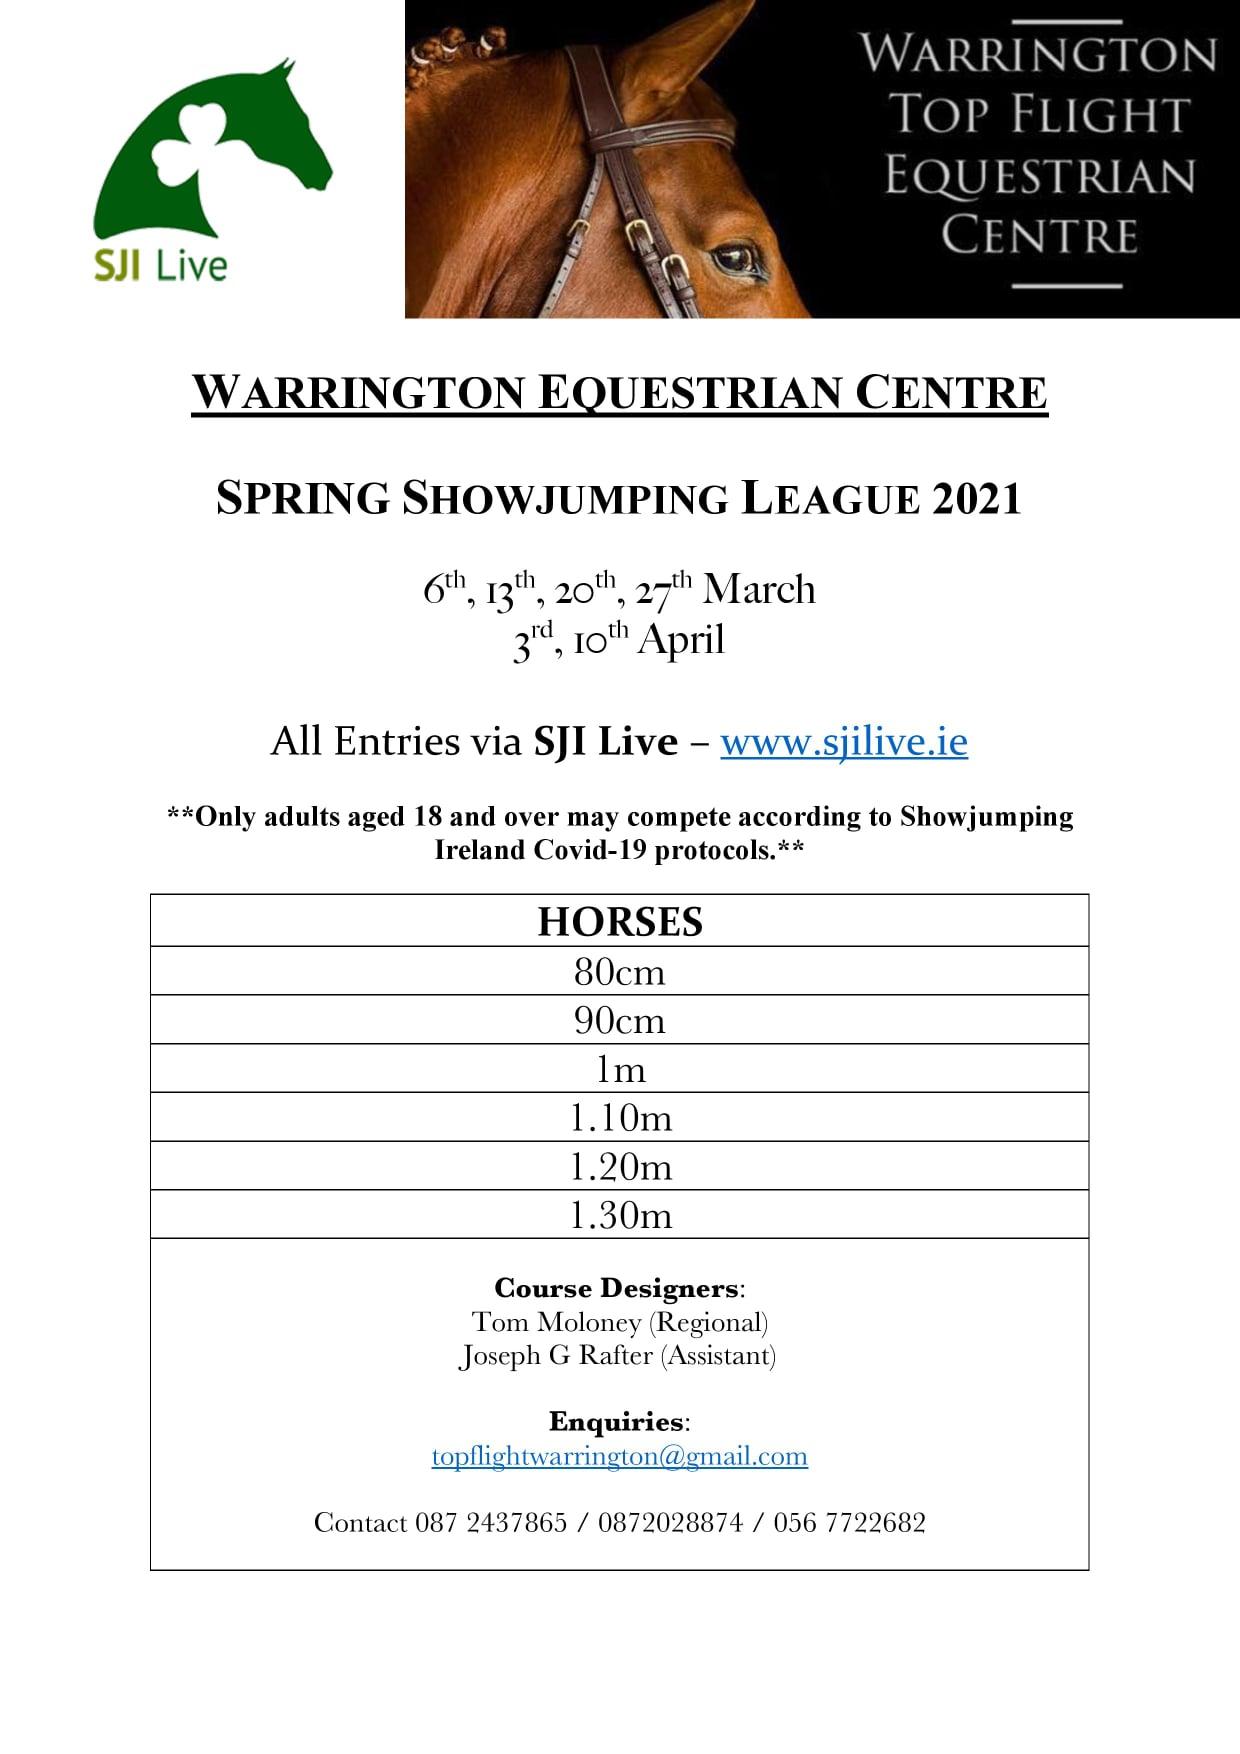 Warrington Equestrian Centre Spring League